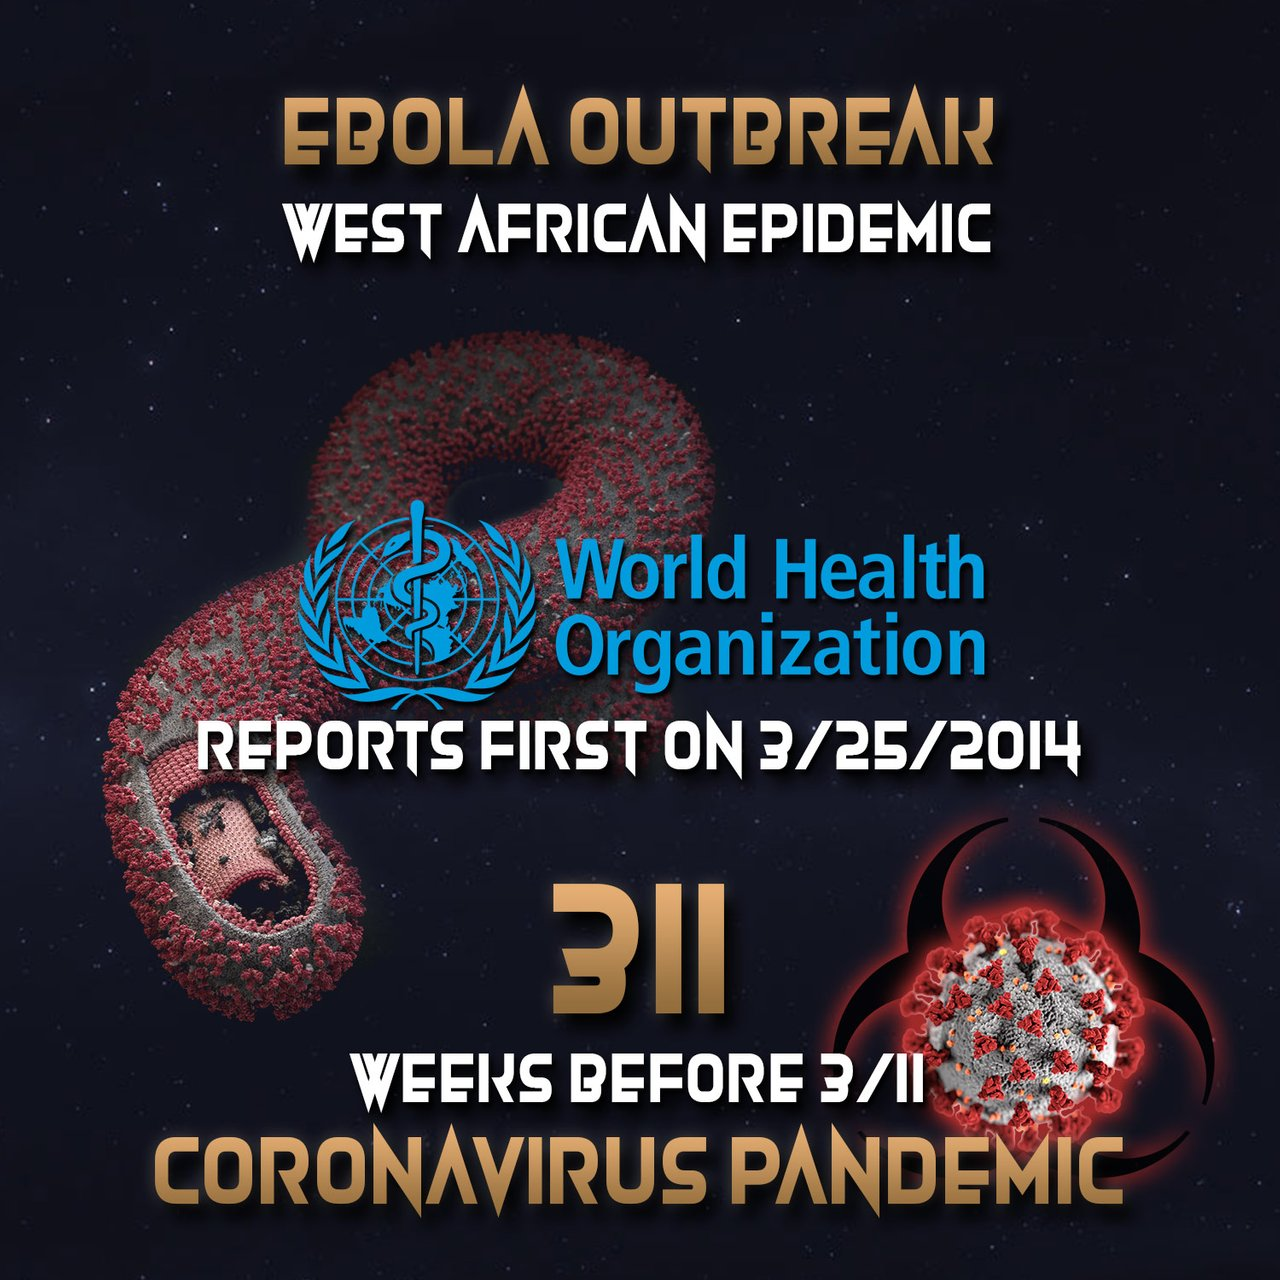 APX Ebola 311 Coronavirus Pandemic.jpg